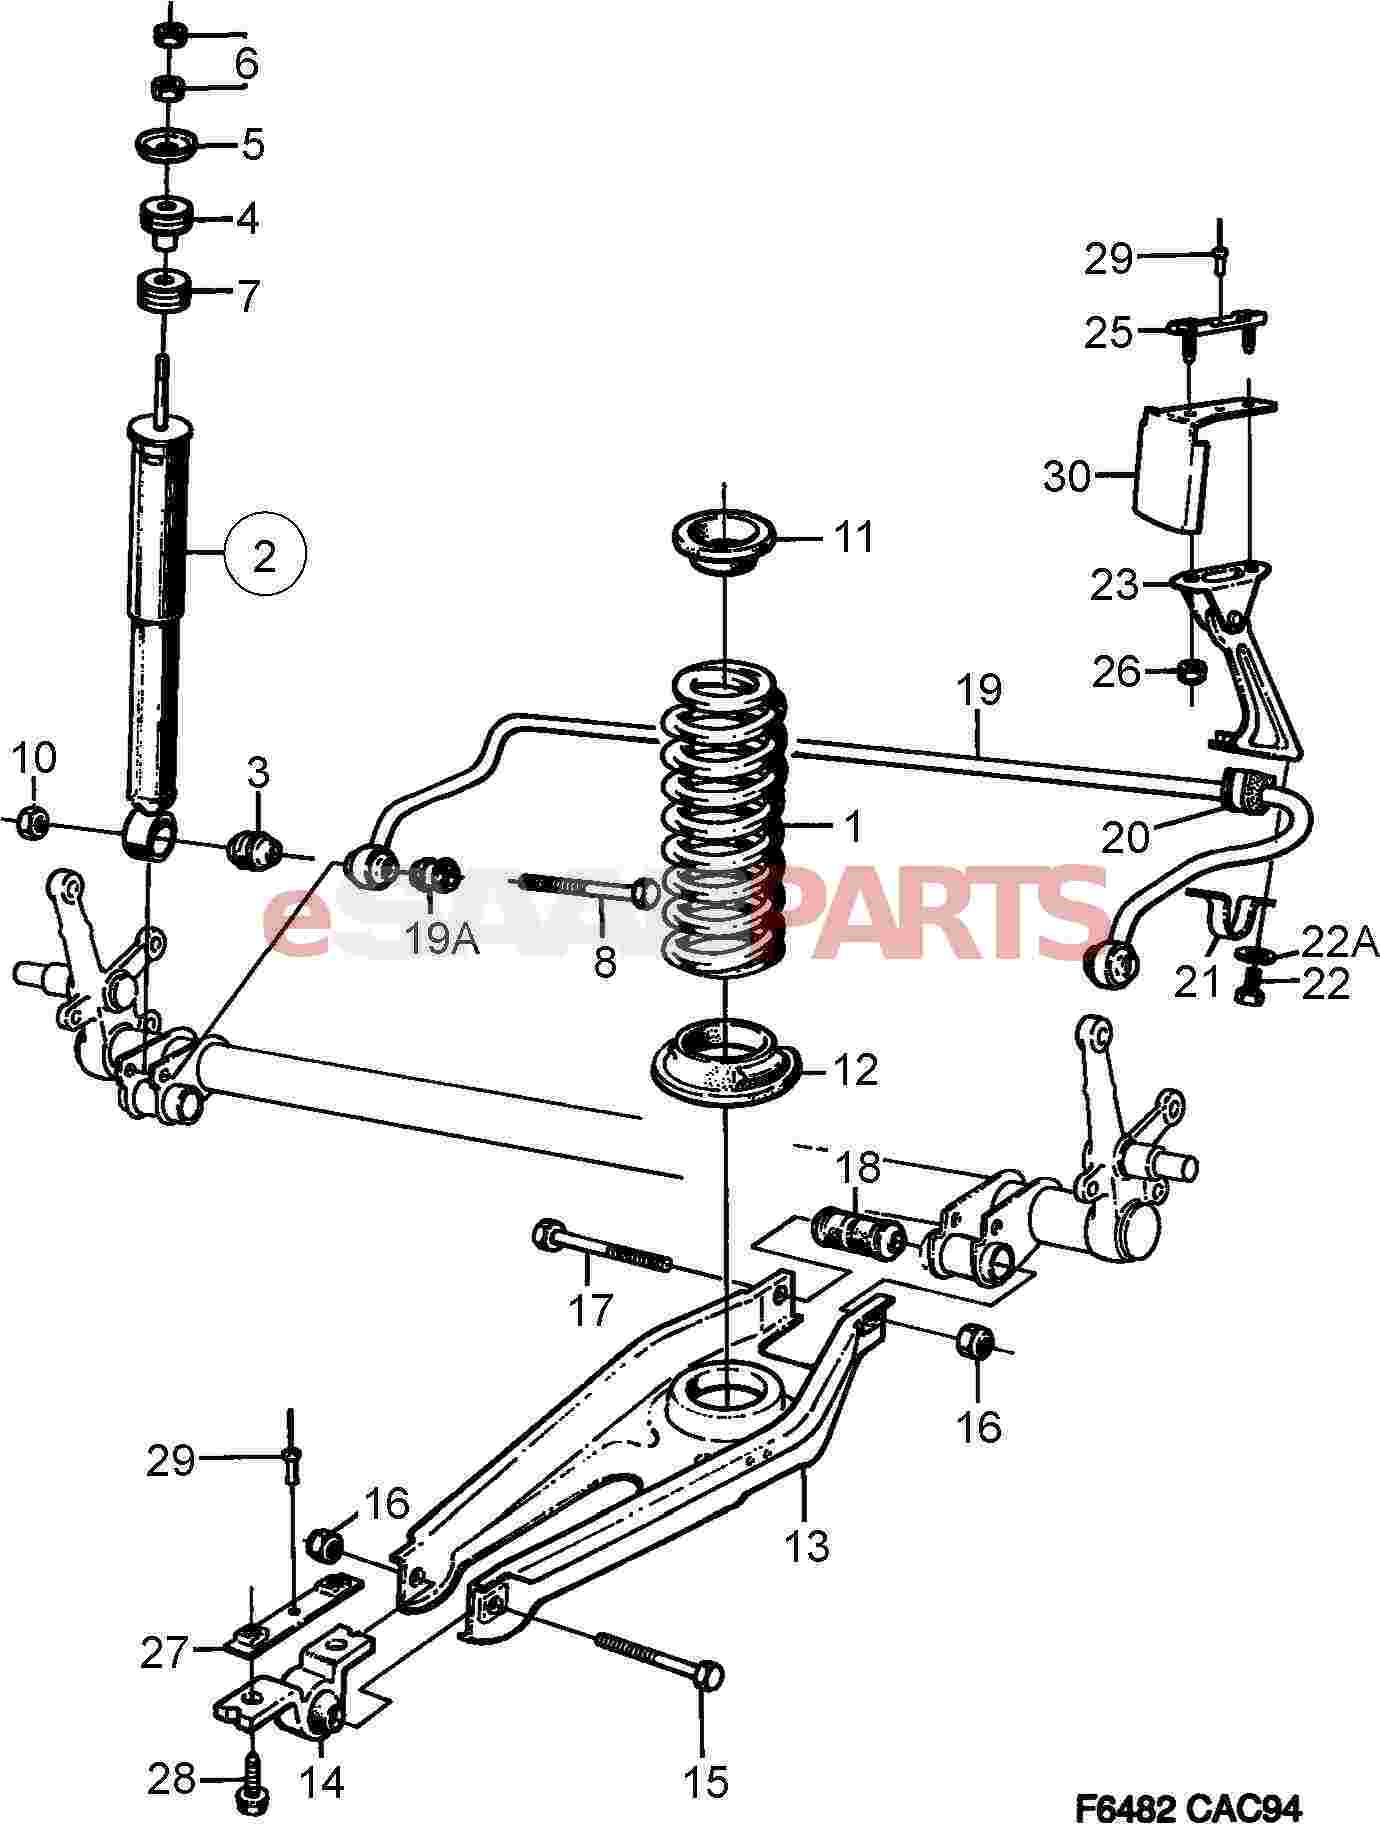 shock absorber diagram [4645008] saab shock absorber kit - genuine saab parts ... #12